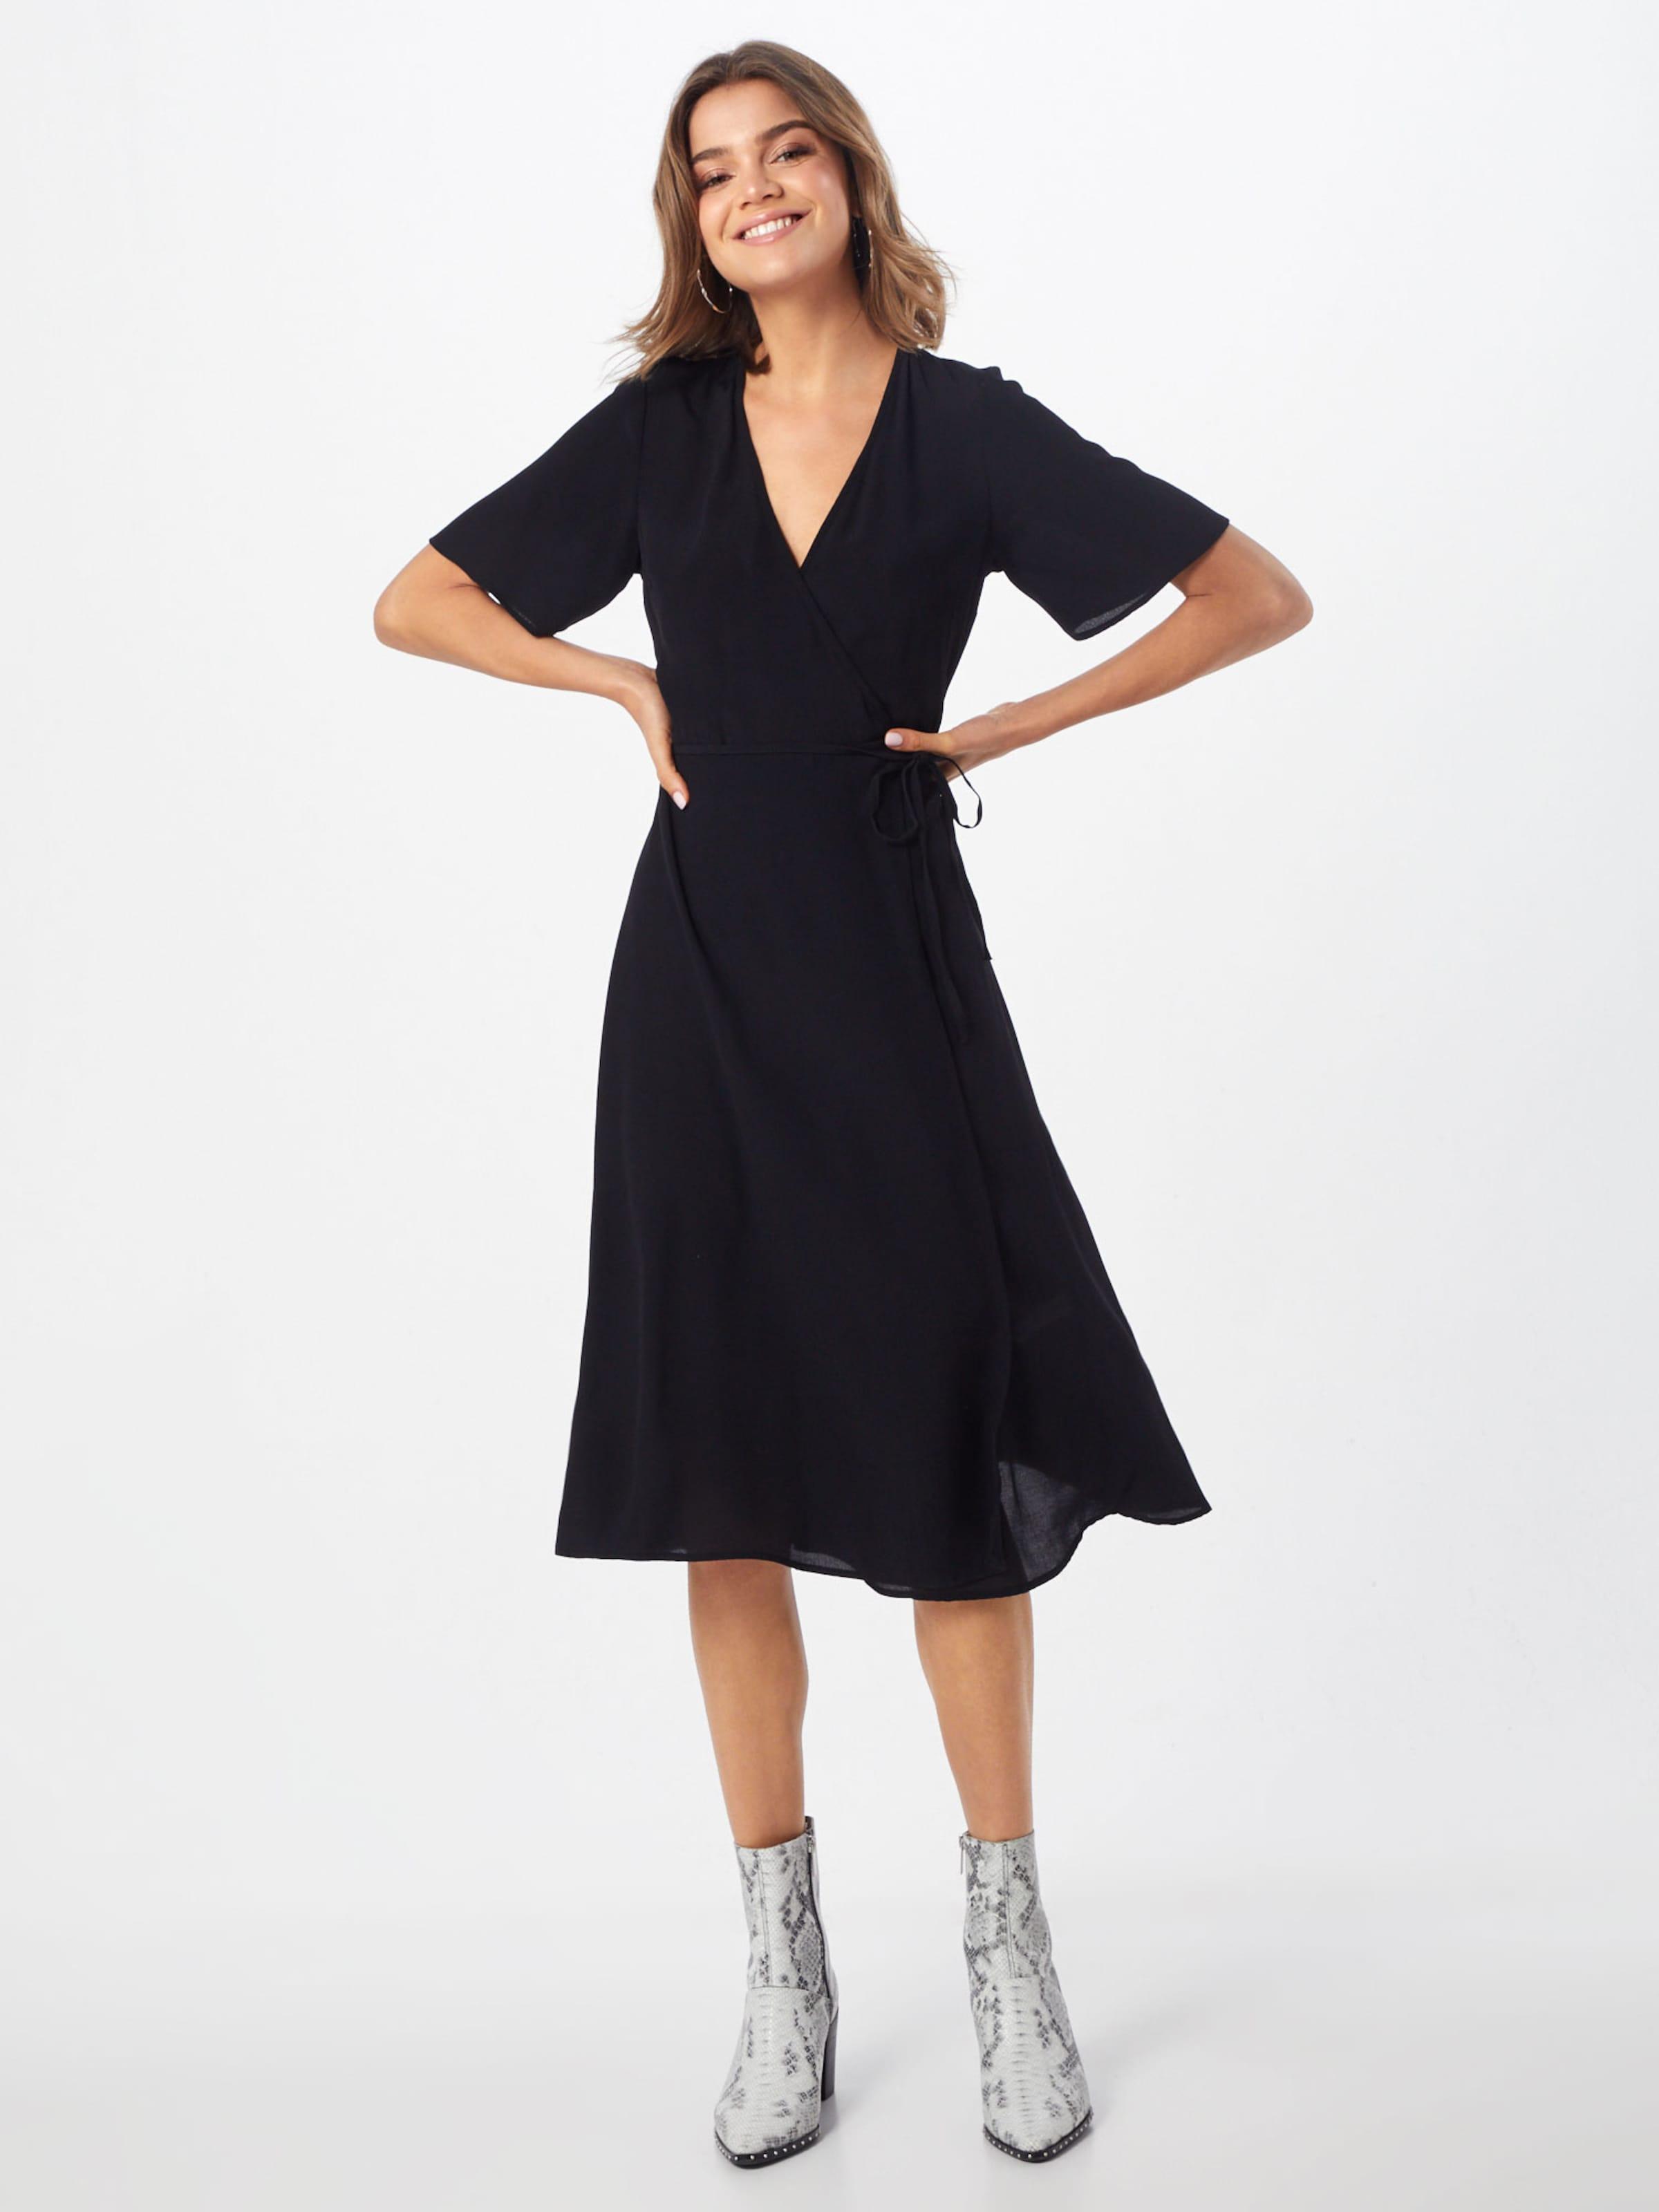 Midi Schwarz New Kleid In 'f Plain Wrap Drs' Look 0kXNnO8wZP